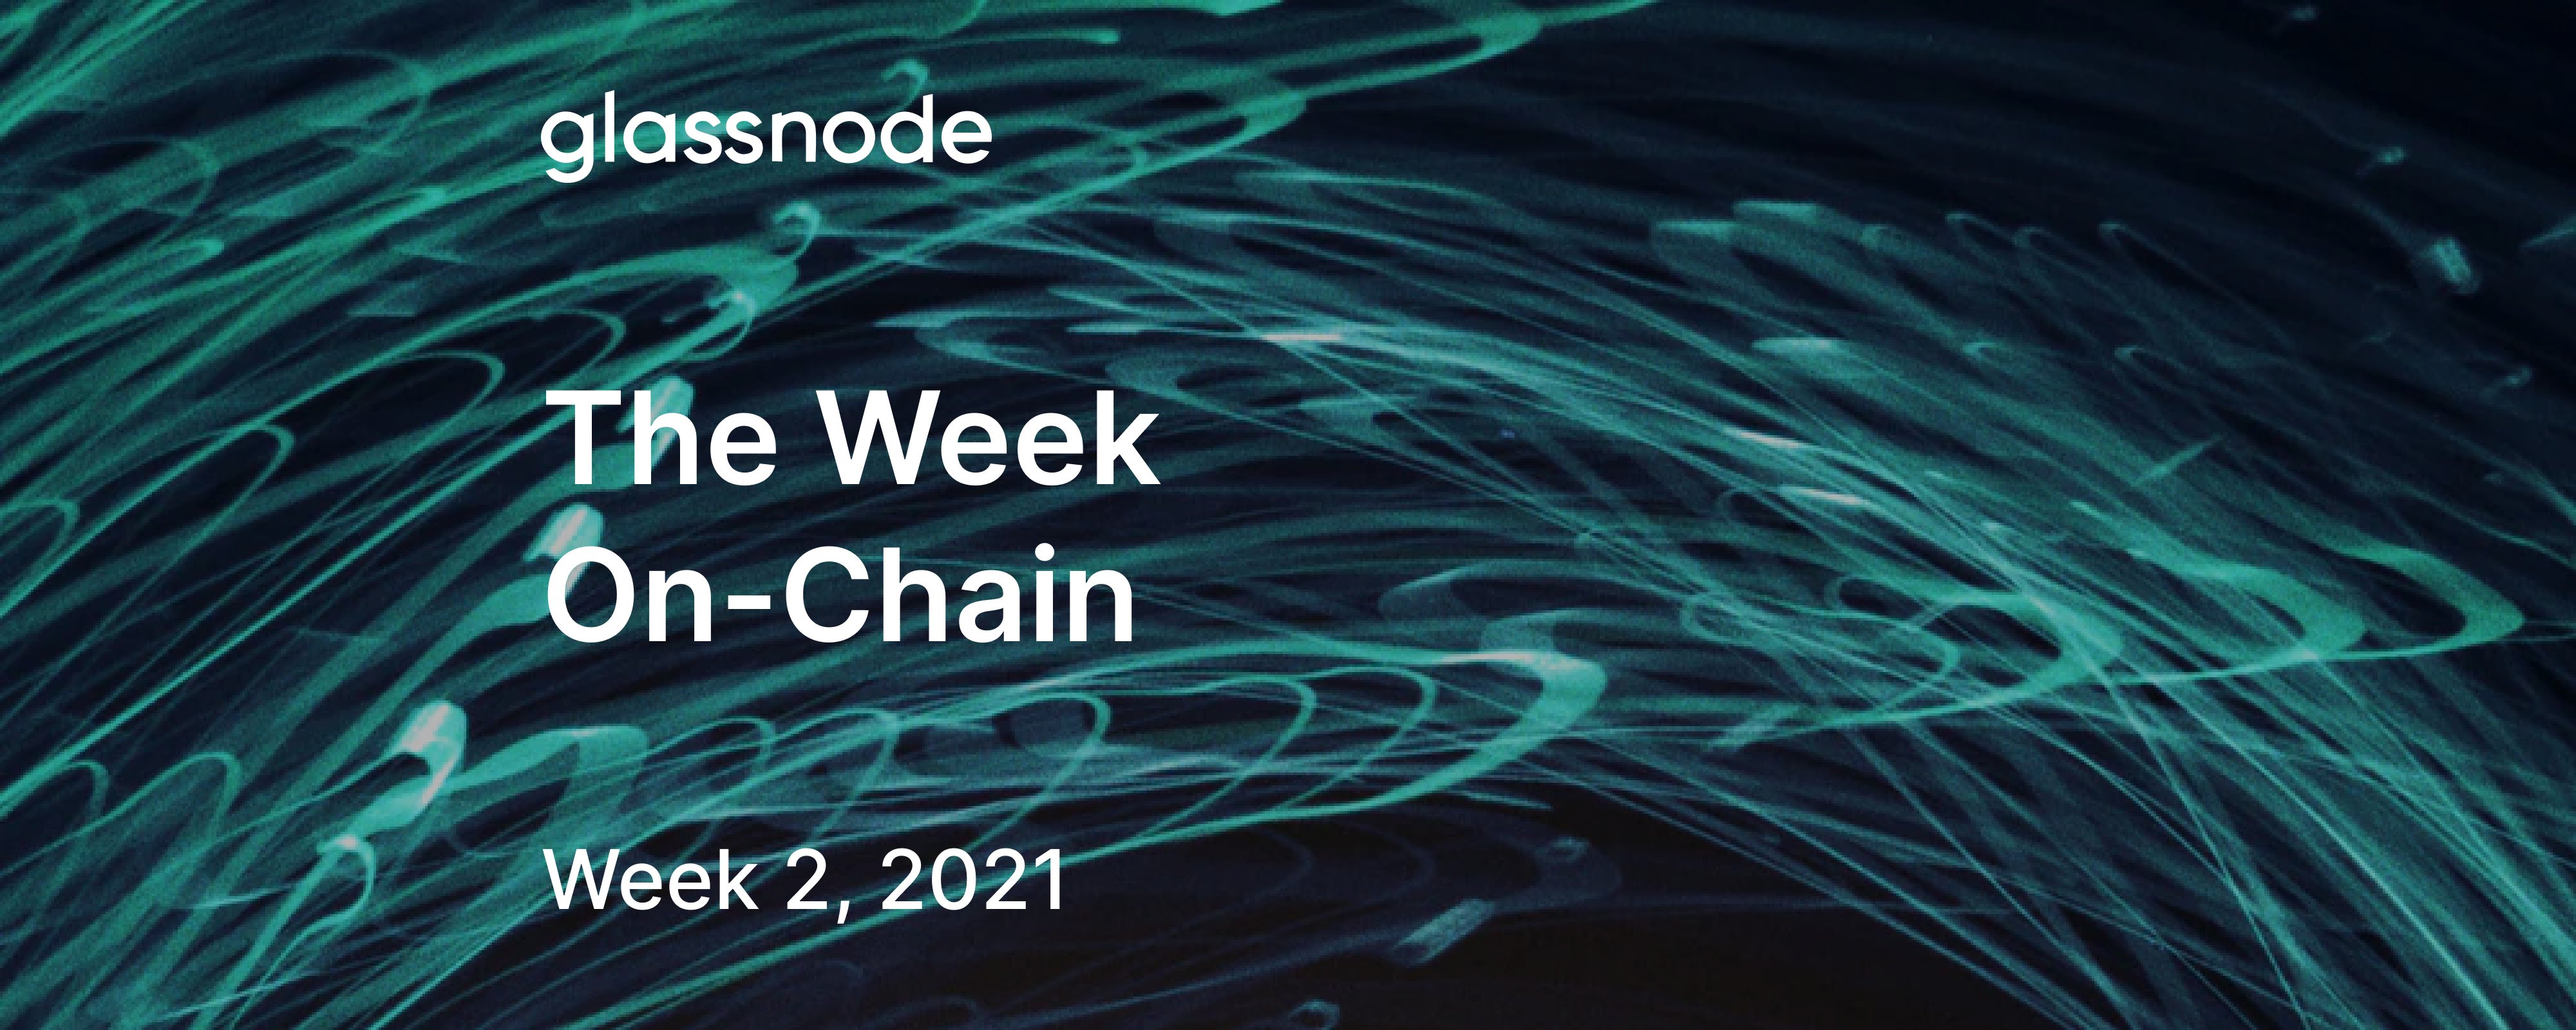 The Week On-Chain (Week 2, 2021)